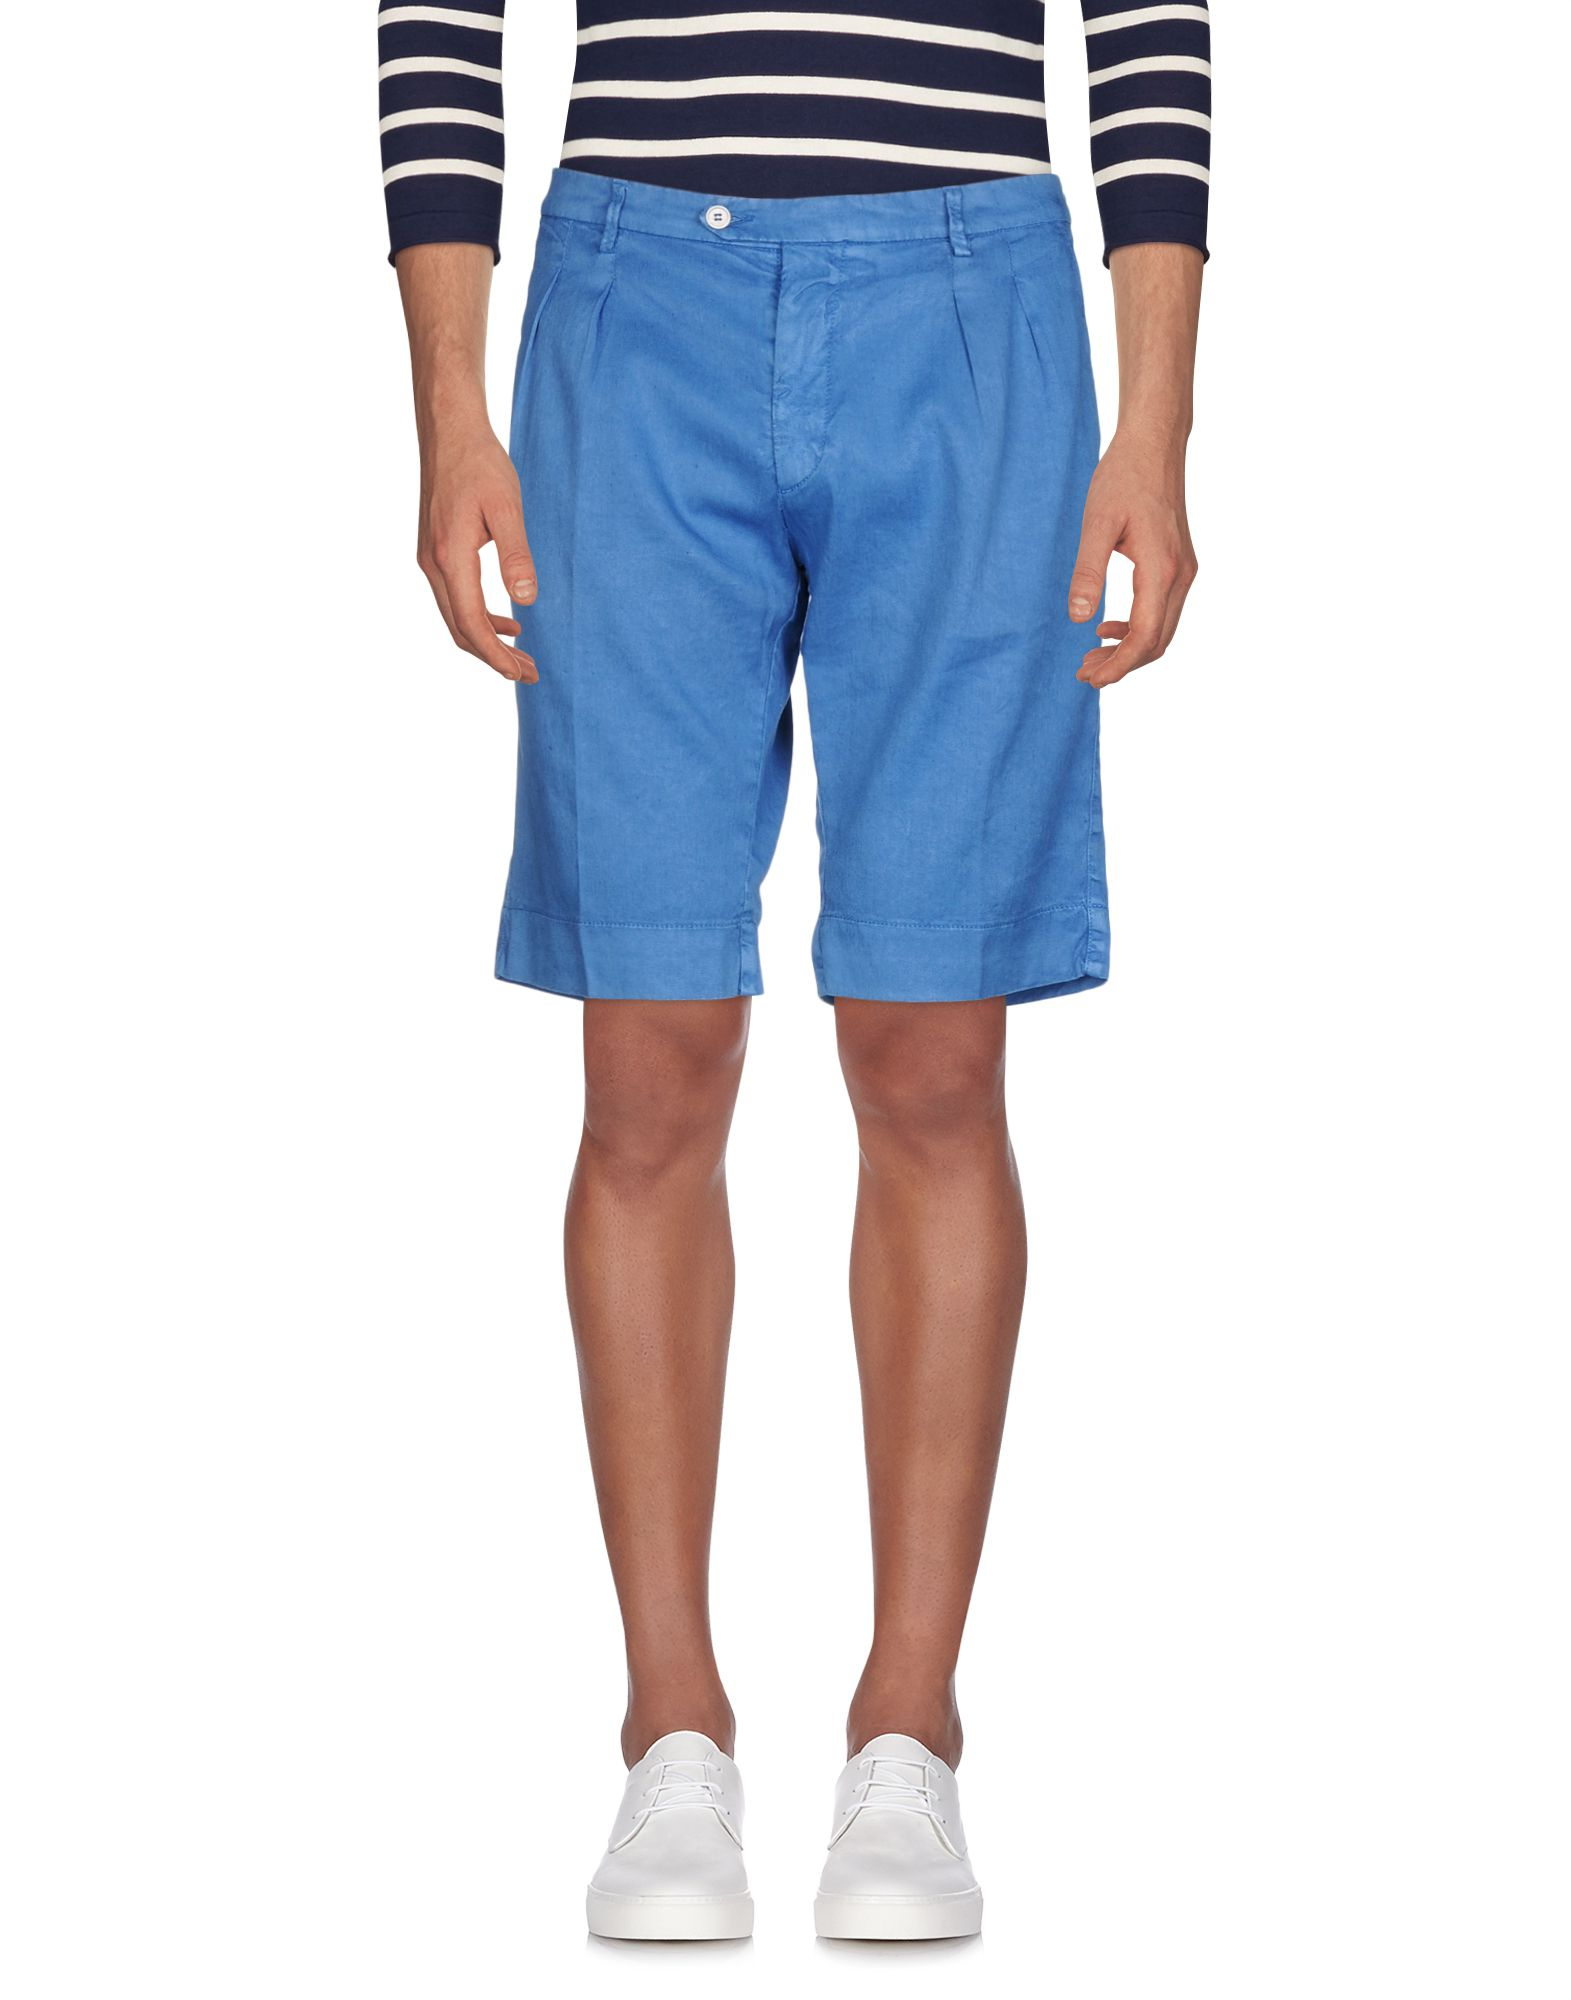 Shorts Jeans Marco Pescarolo Uomo - Acquista online su